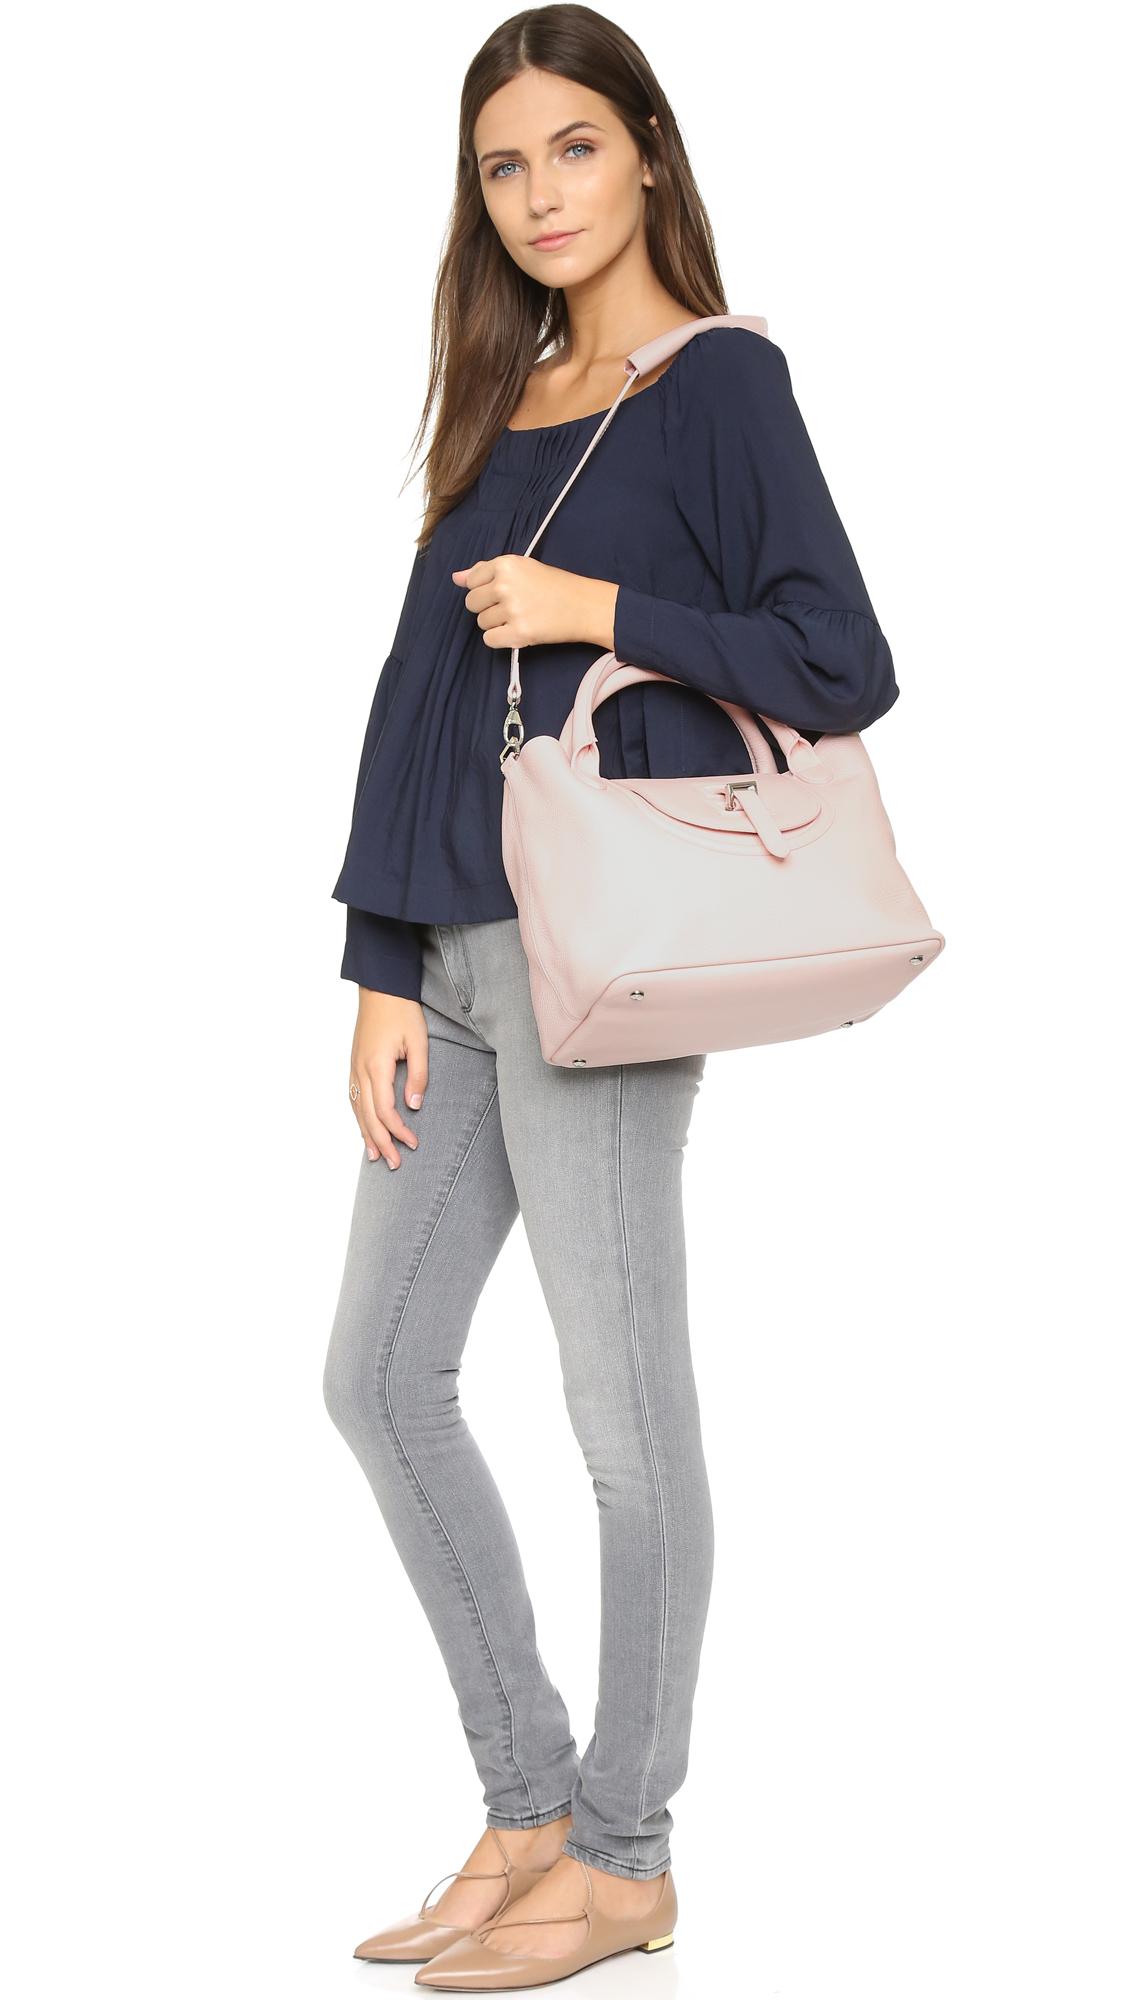 lyst meli melo classic medium thela halo bag pastel pink in pink. Black Bedroom Furniture Sets. Home Design Ideas